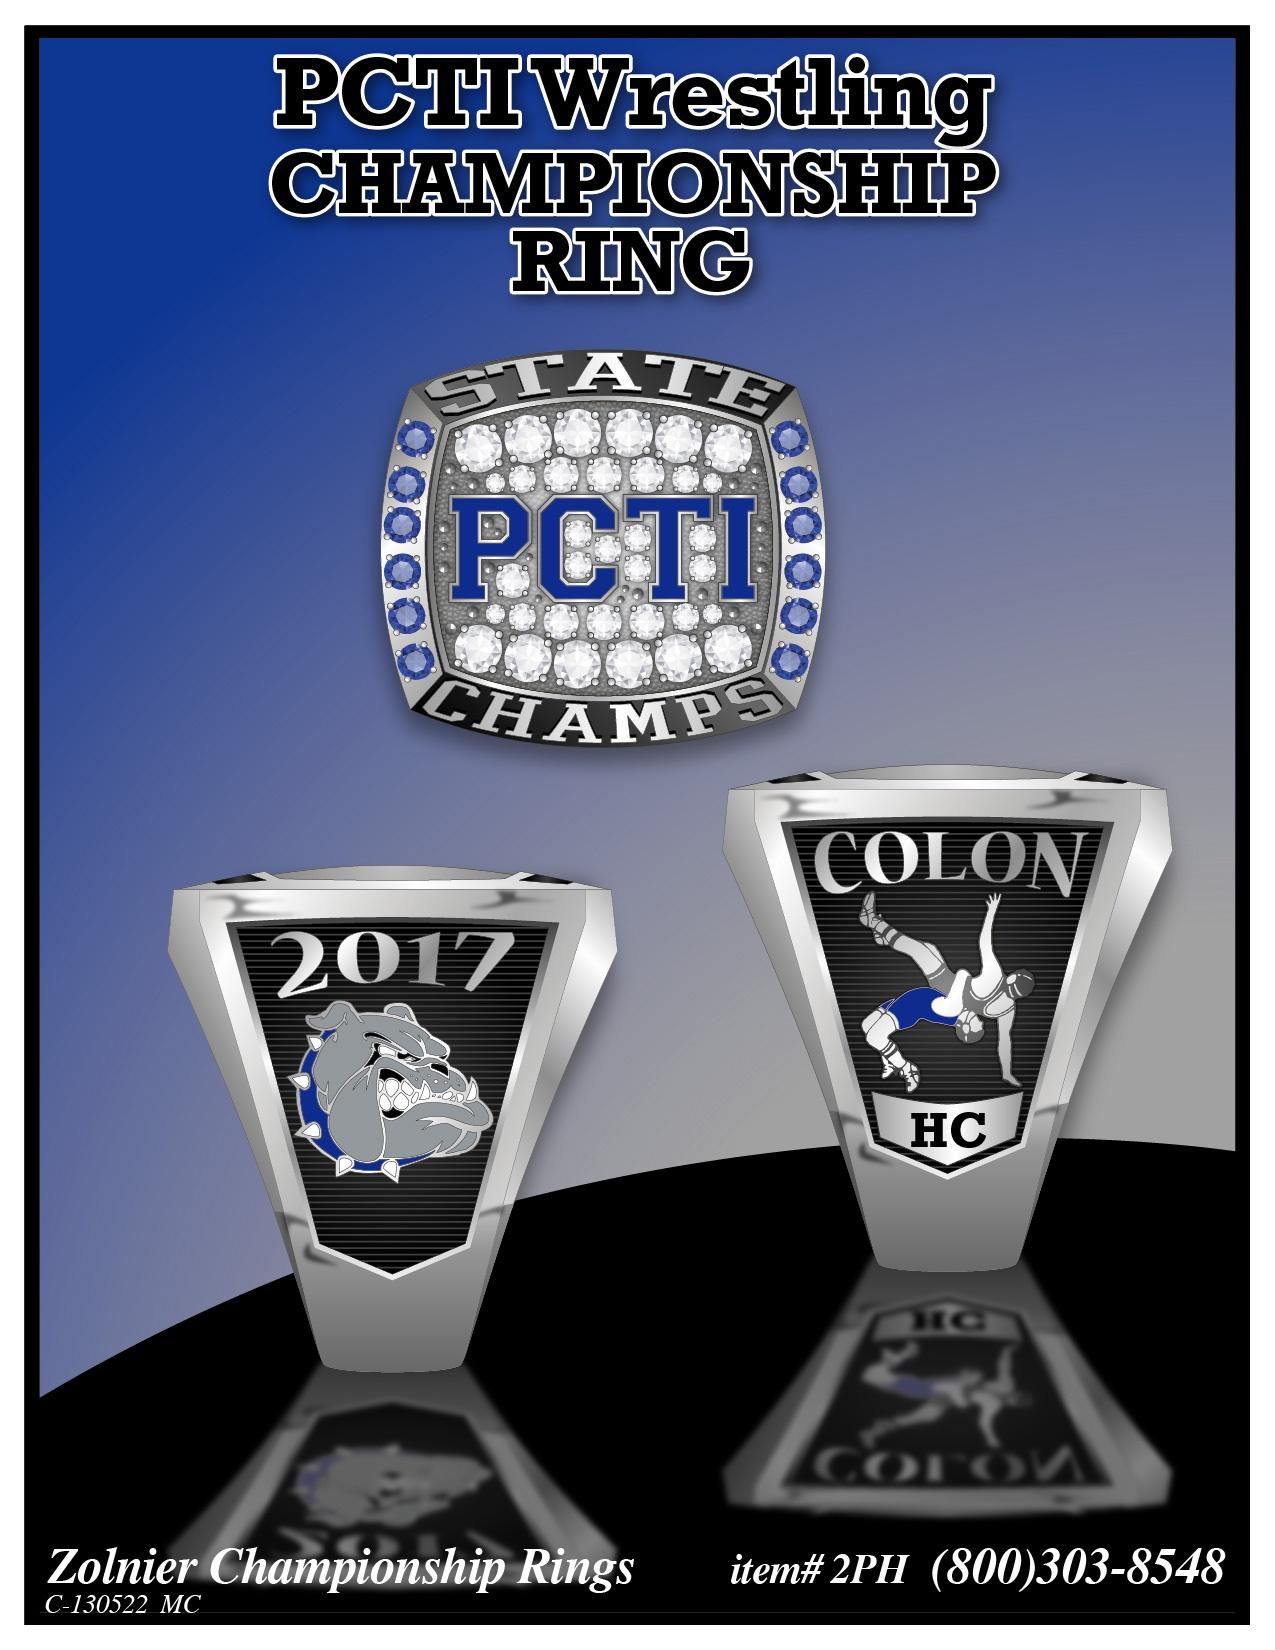 C-130522 Wrestling Championship Ring